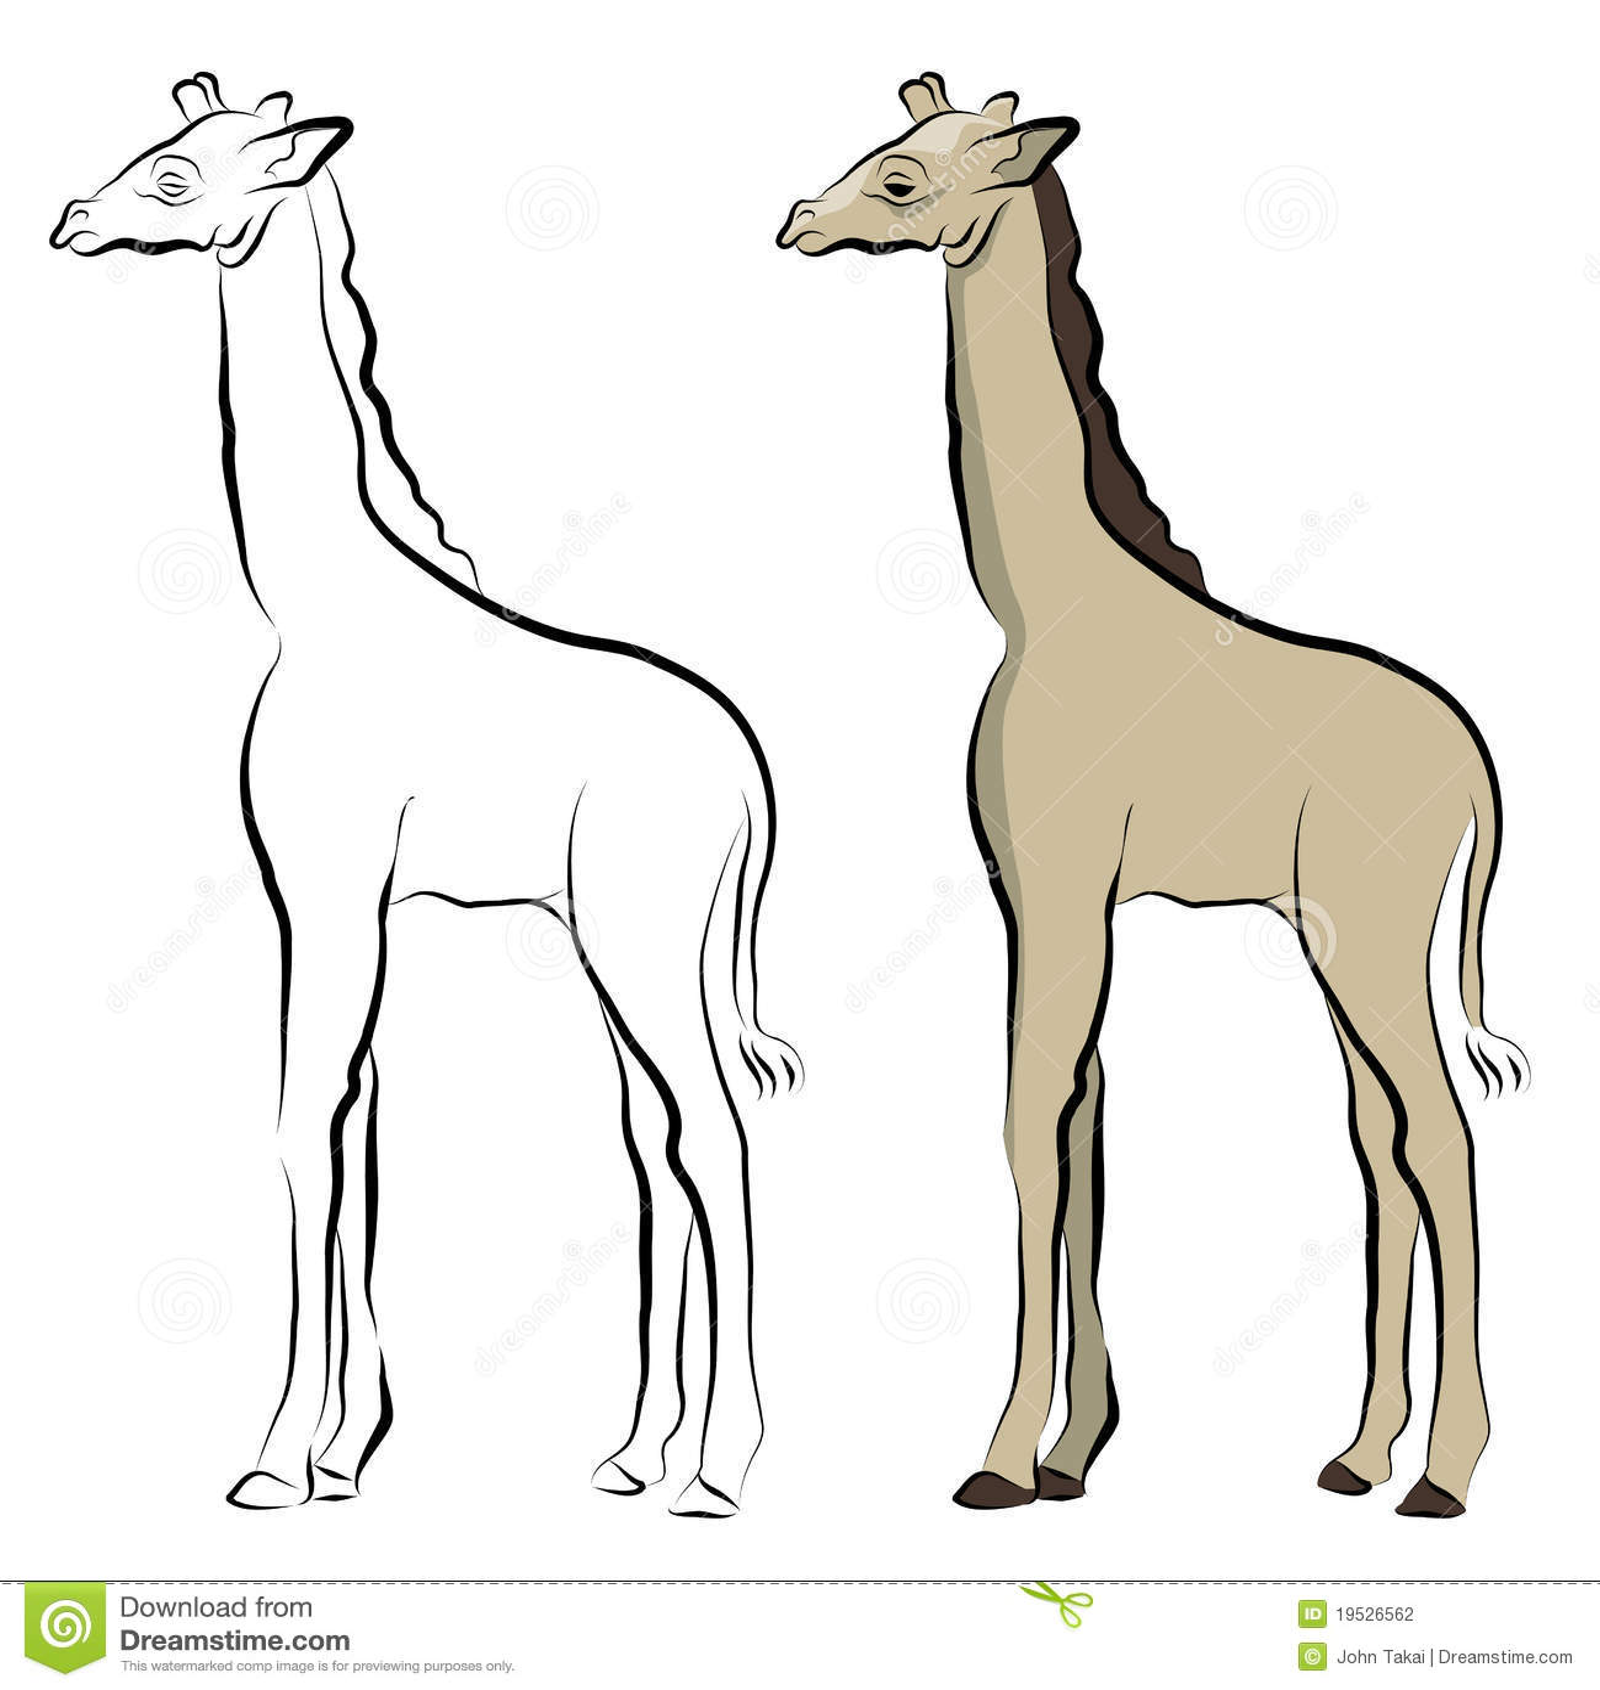 Line Drawing Giraffe : Giraffe line drawing stock photography image